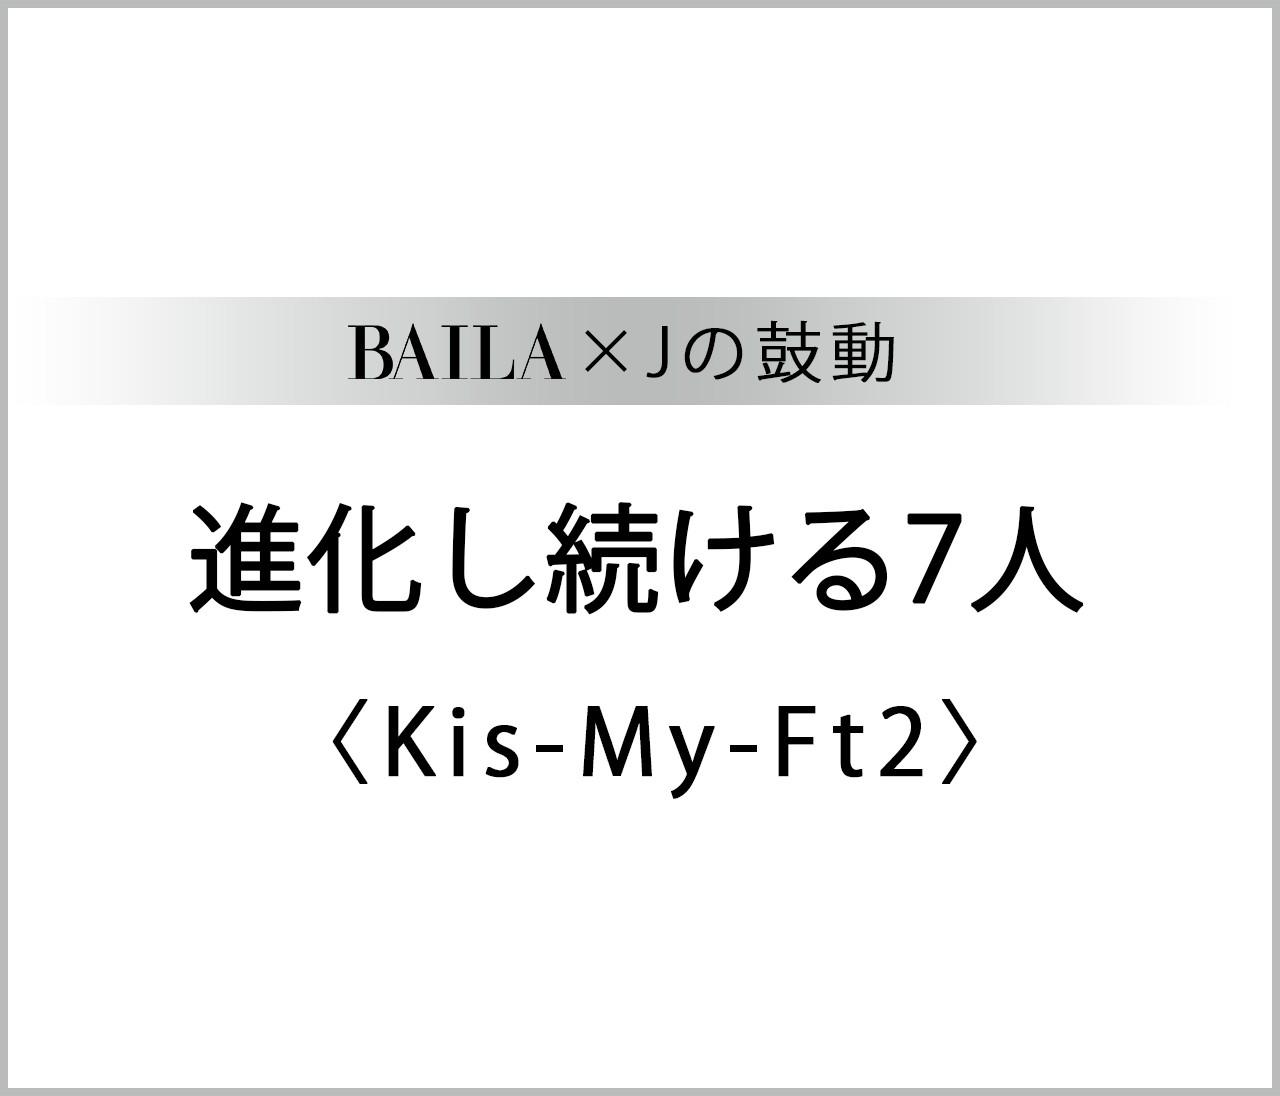 【 #KisMyFt2 】Kis-My-Ft2スペシャルインタビューまとめ【BAILA × Jの鼓動】